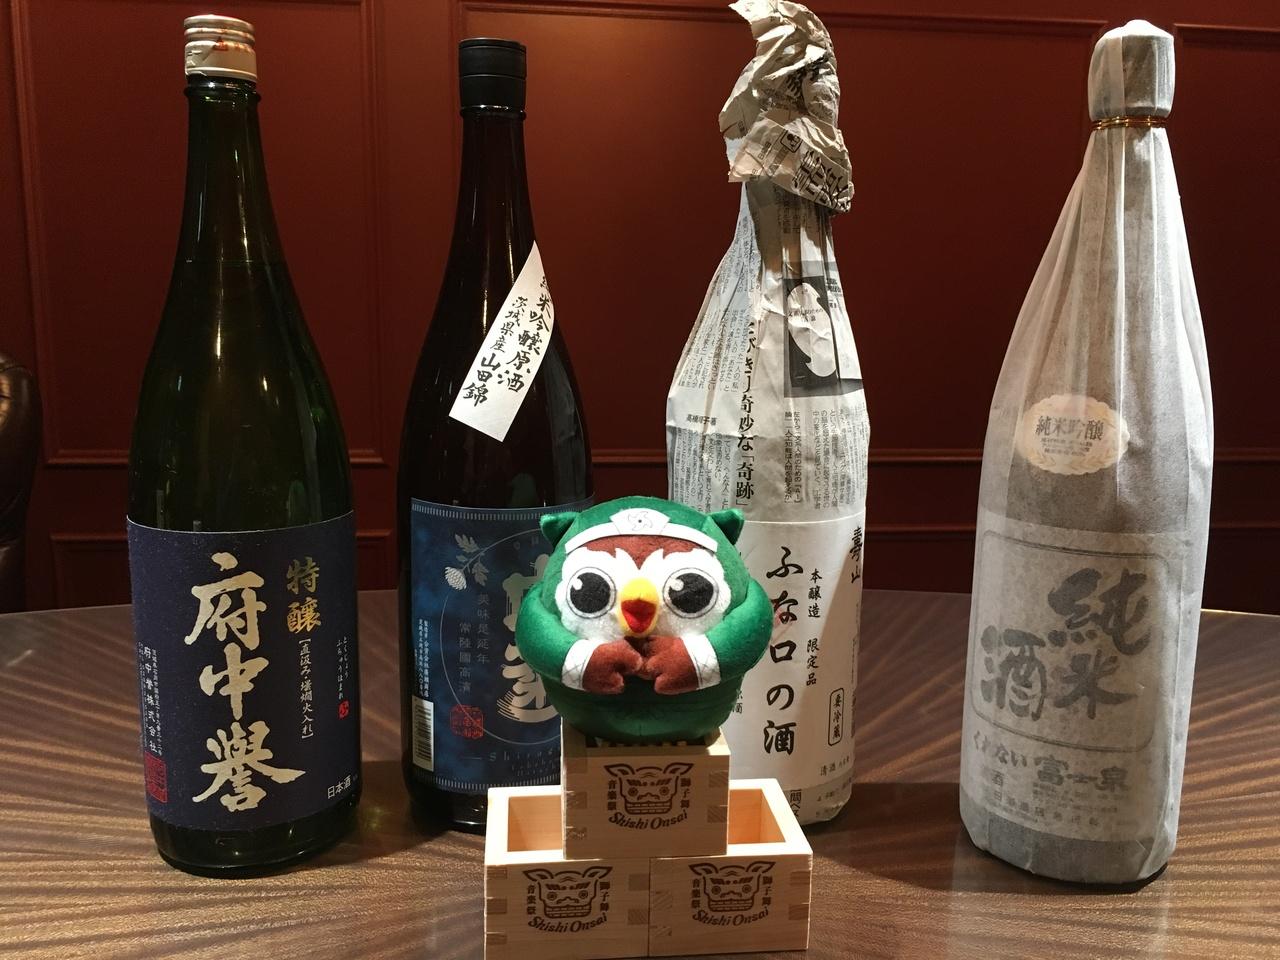 【Ticket】Let's experience Japanese sake